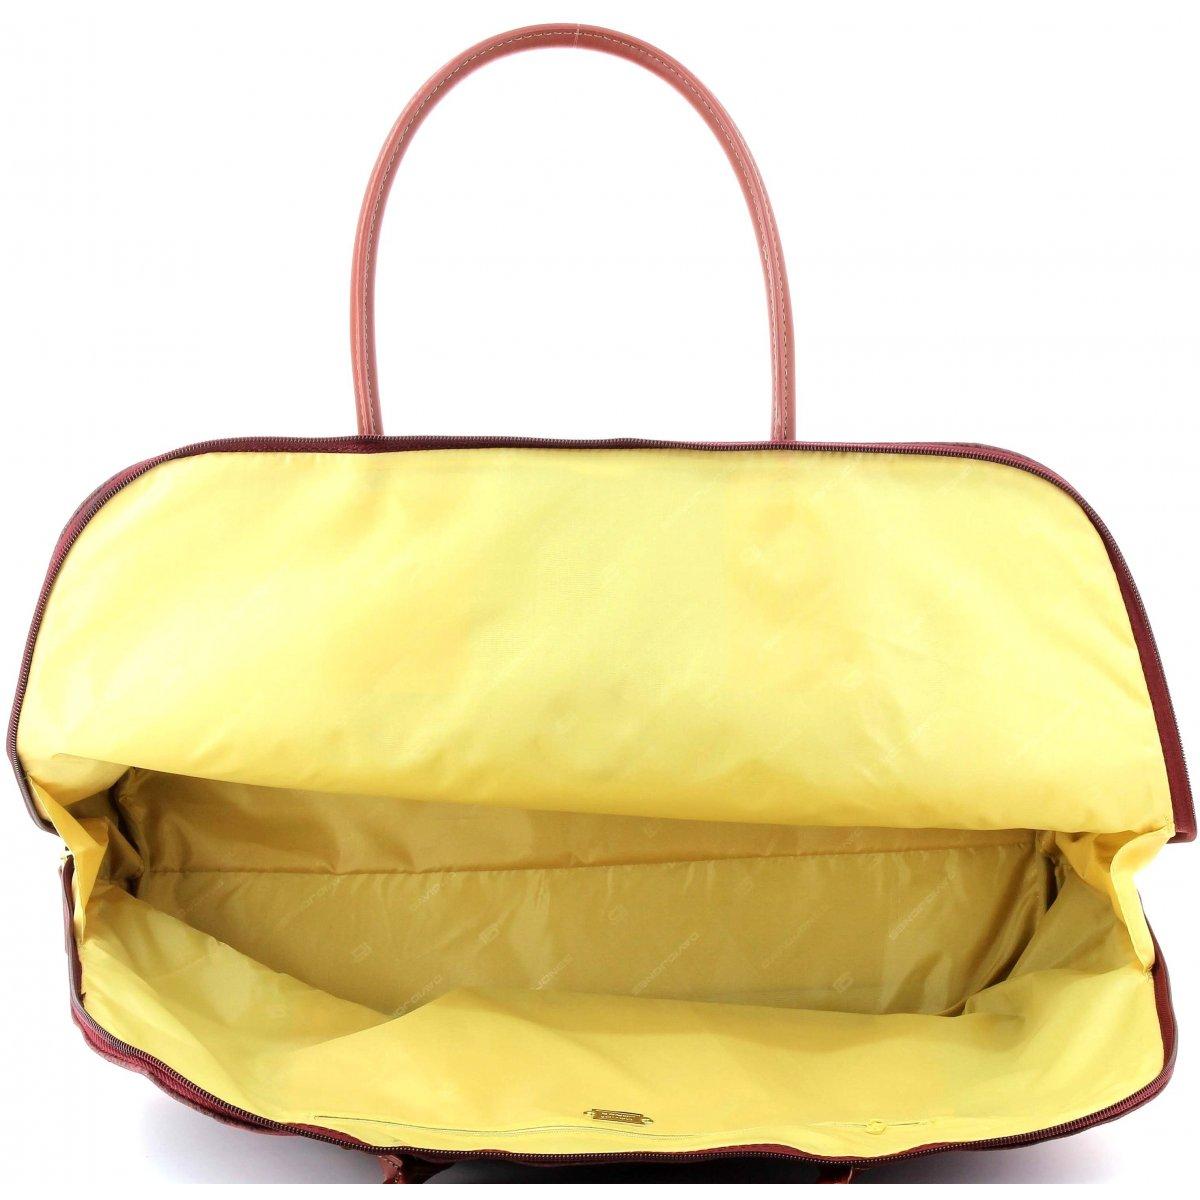 sac de voyage 48h david jones 77777c couleur principale vert promotion. Black Bedroom Furniture Sets. Home Design Ideas